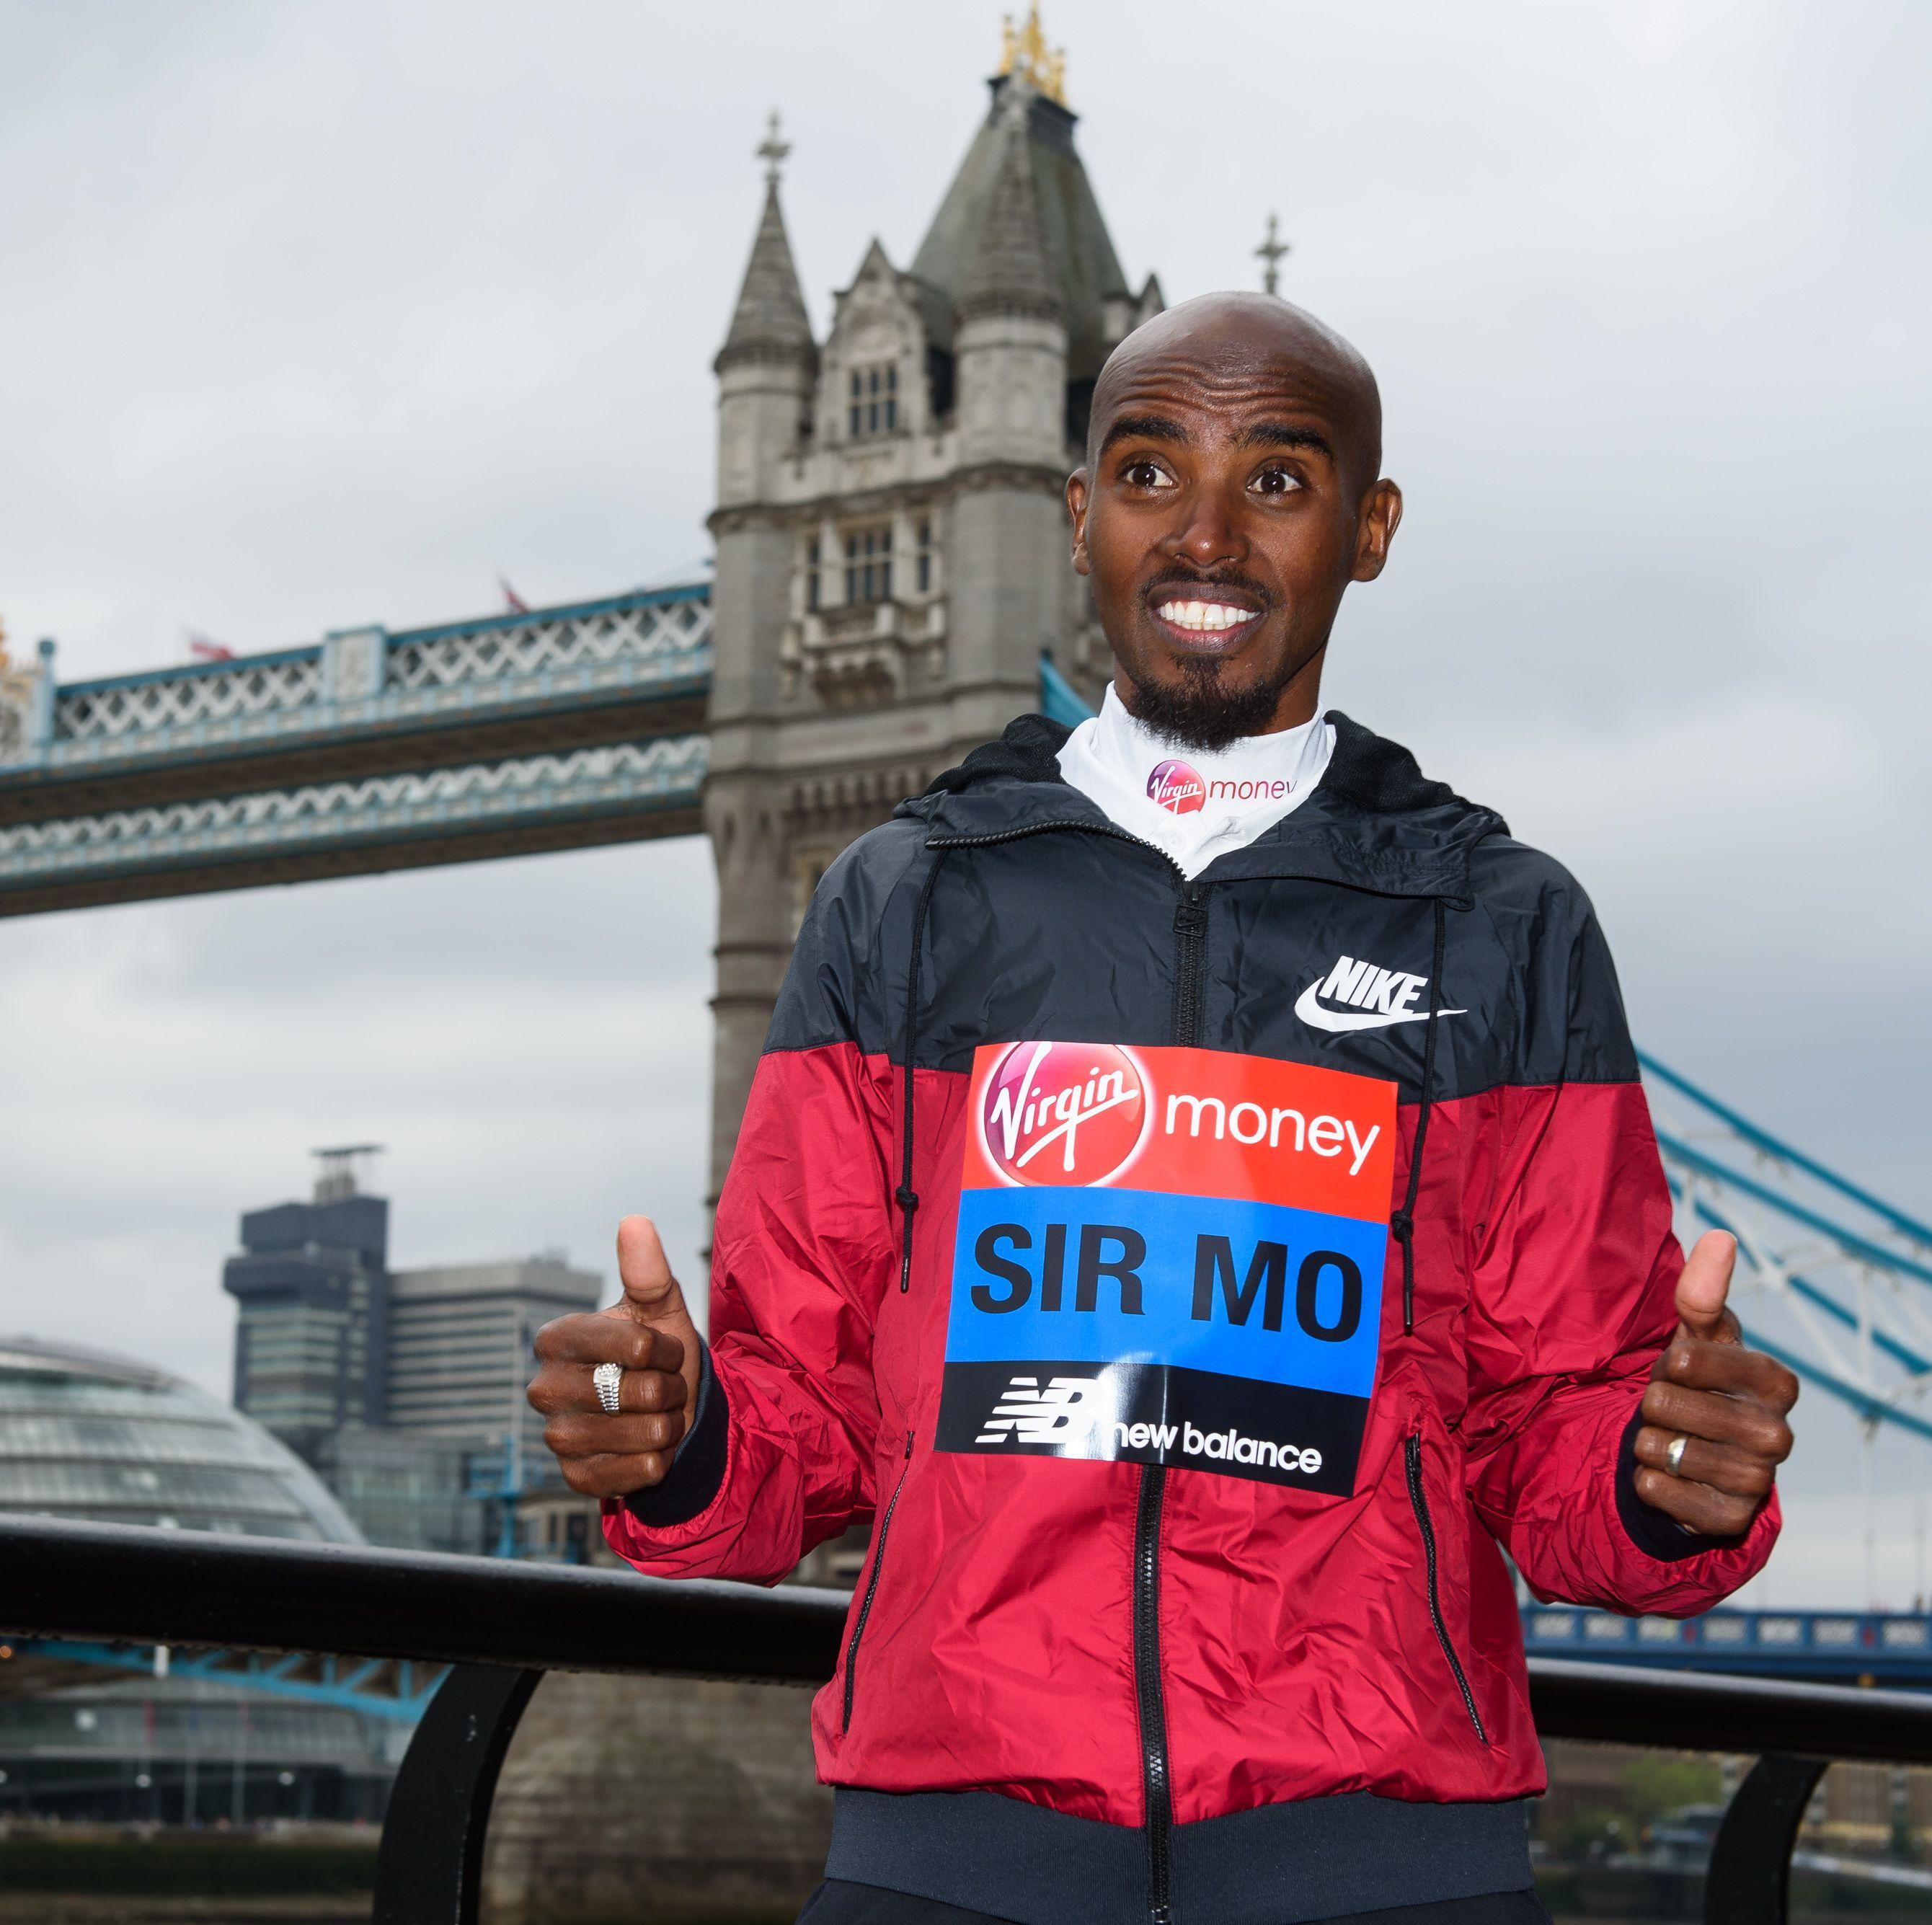 Mo Farah Runs on Treadmill Set at World-Record Pace, Falls Off Twice